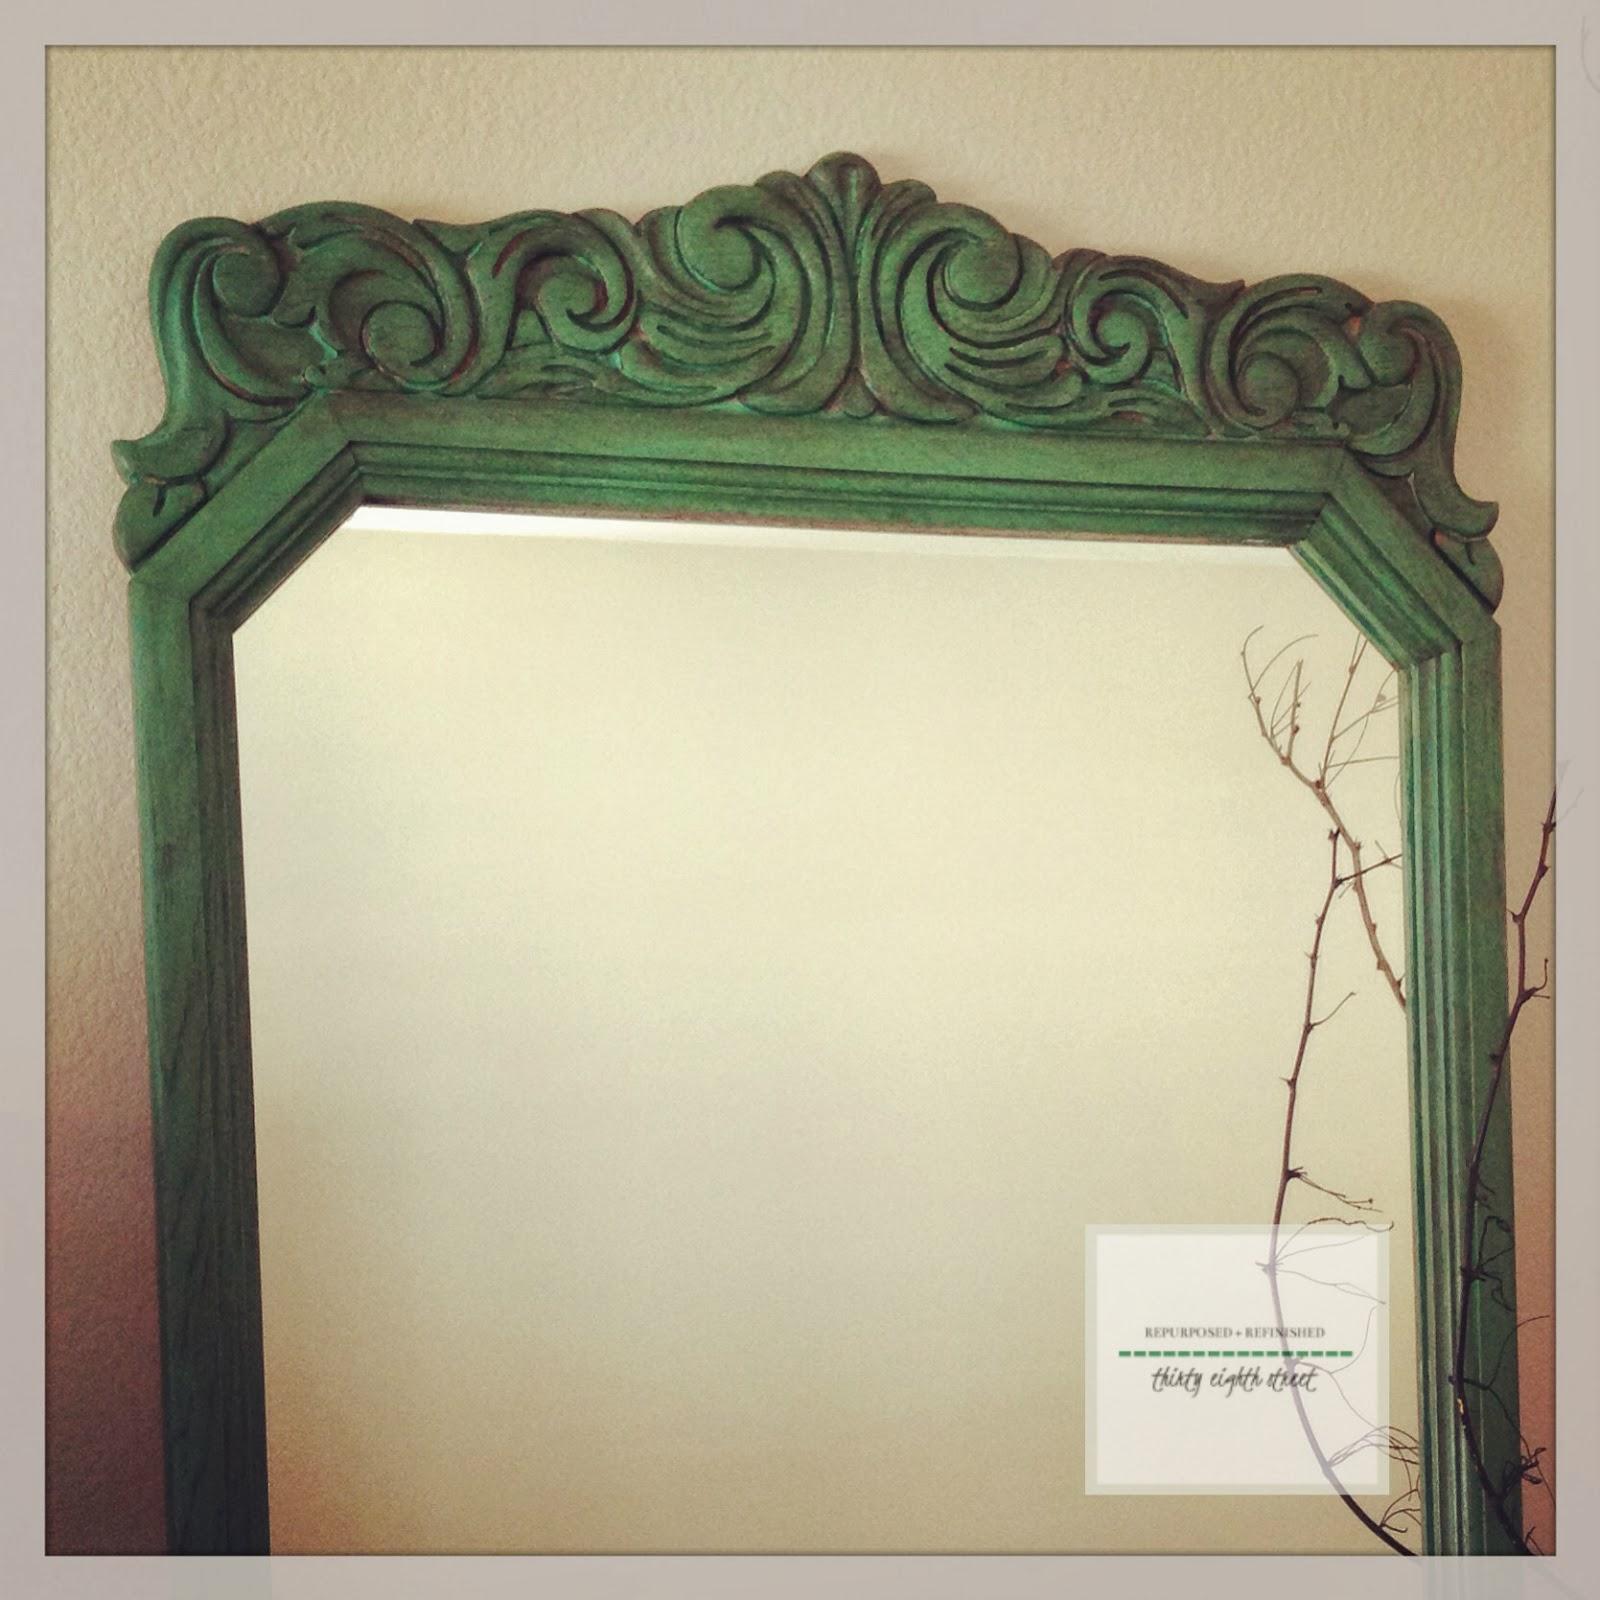 The Flintock Mirror - Thirty Eighth Street